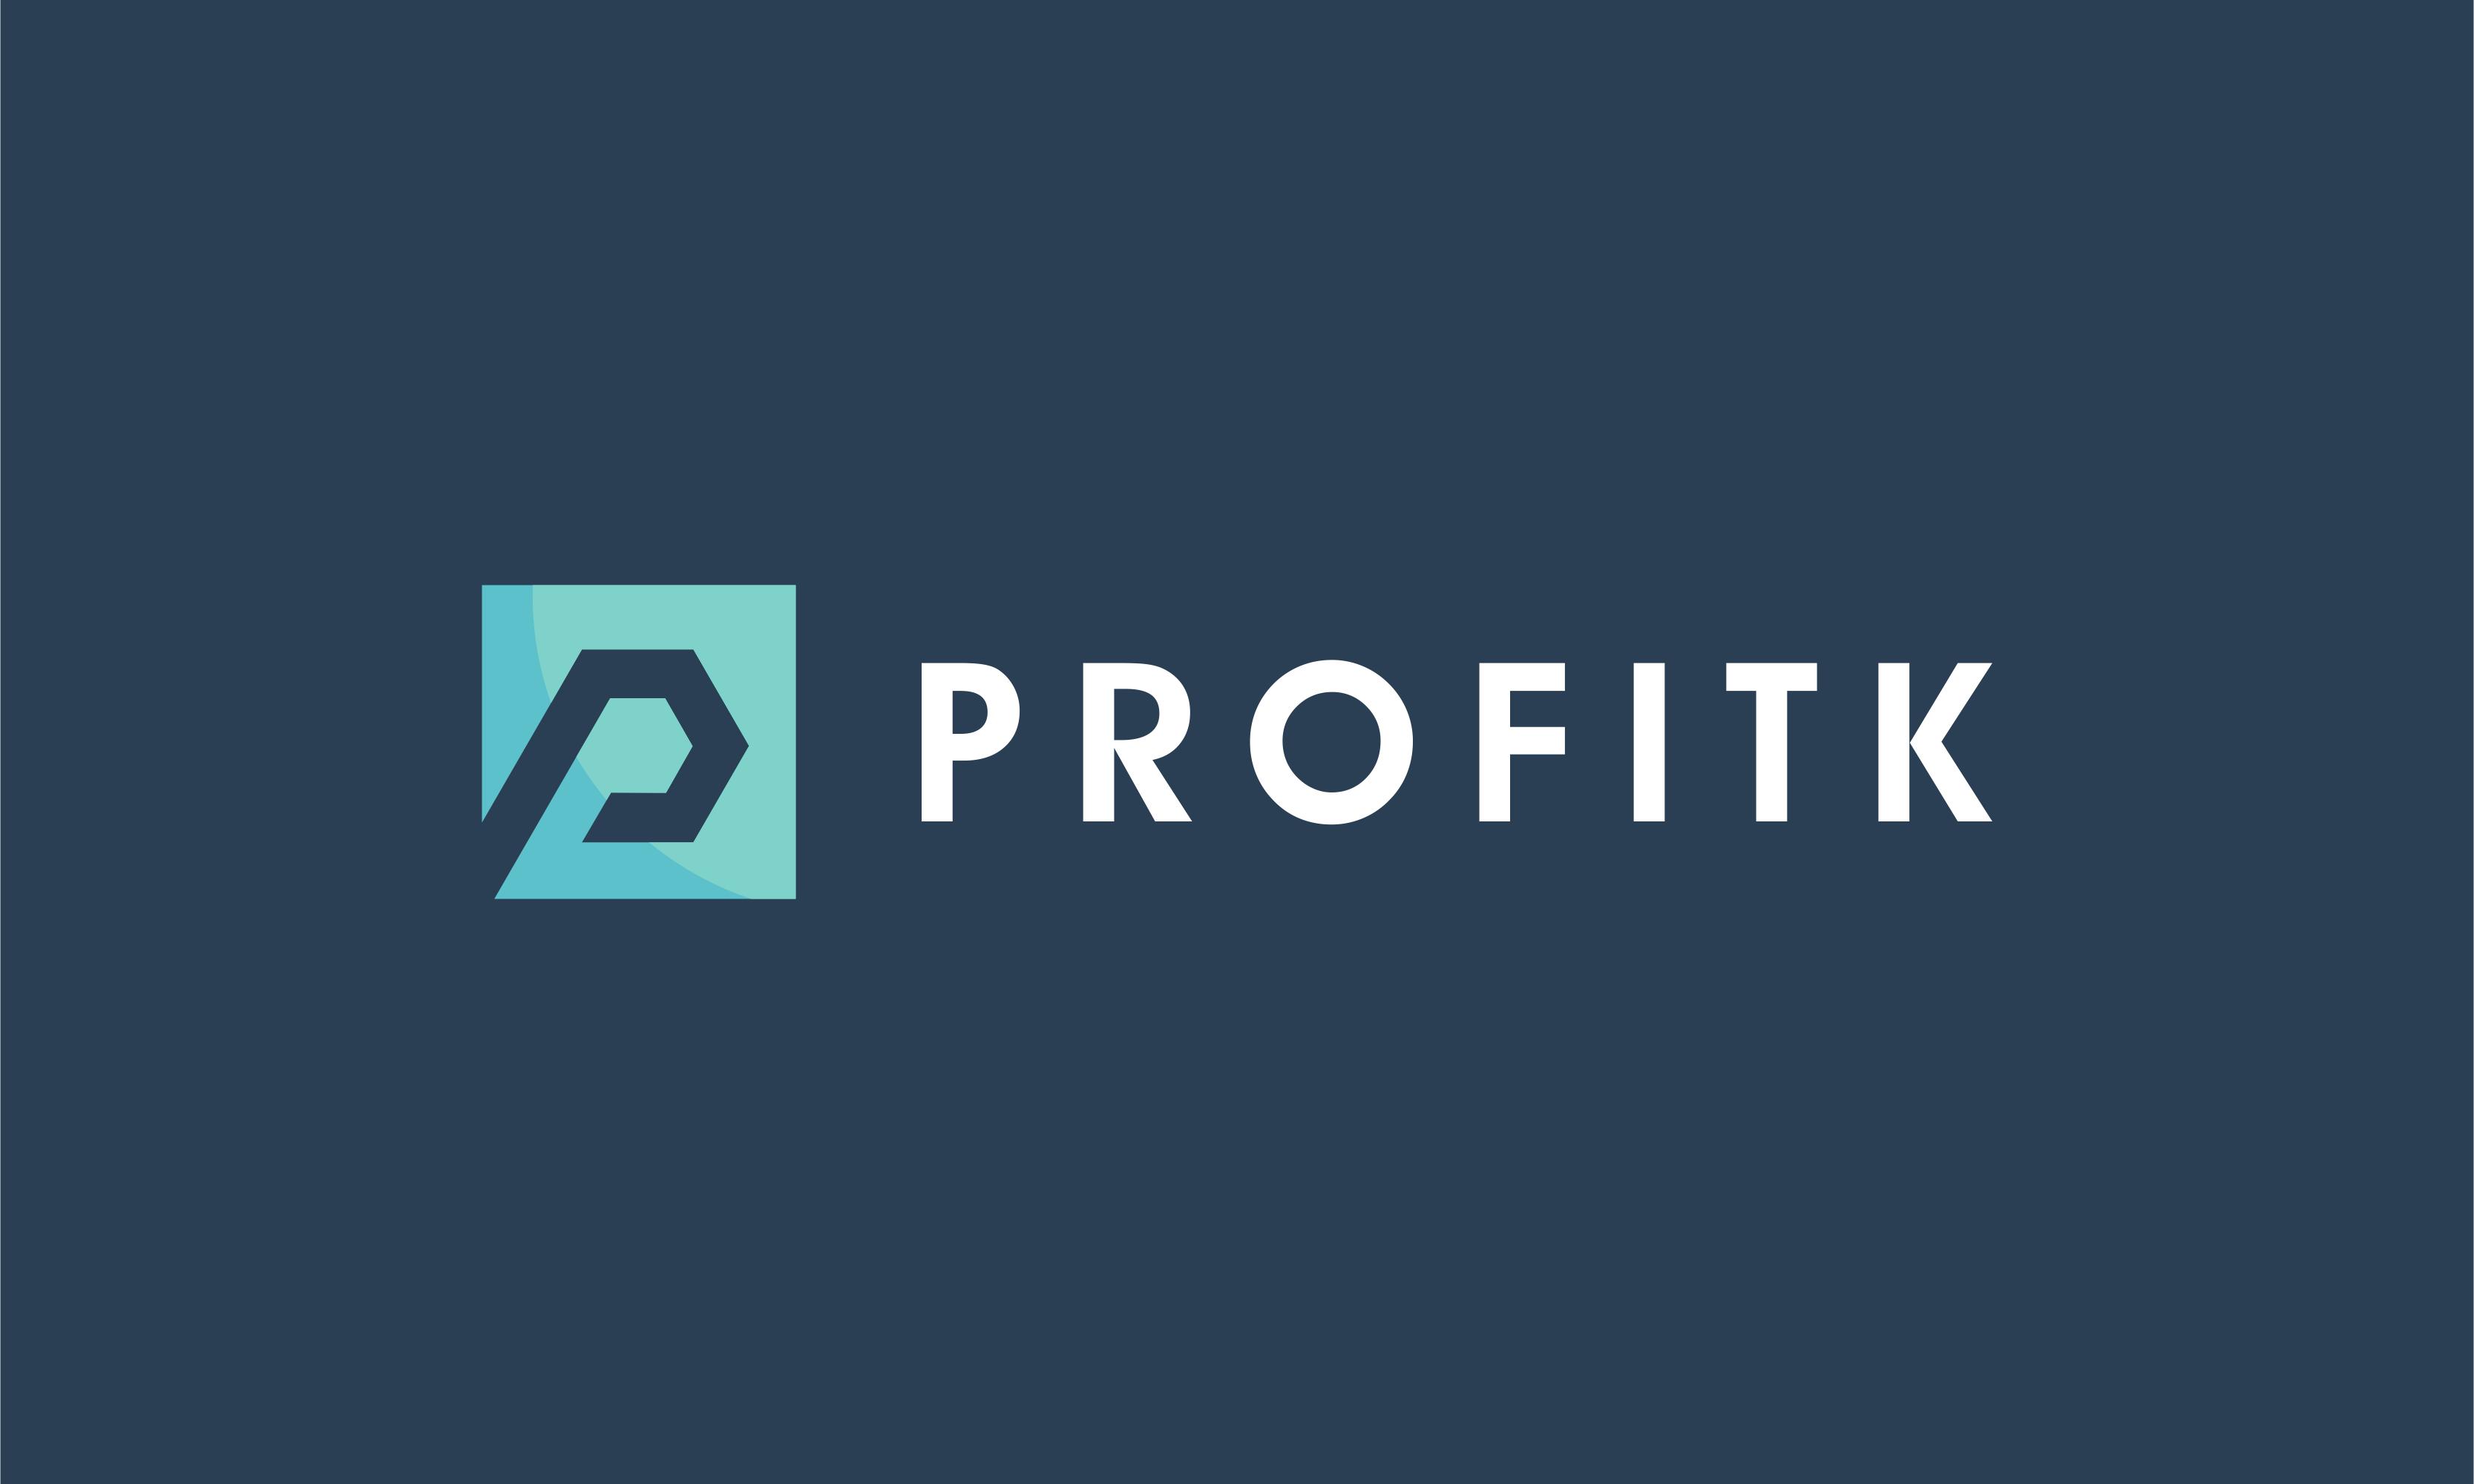 Profitk